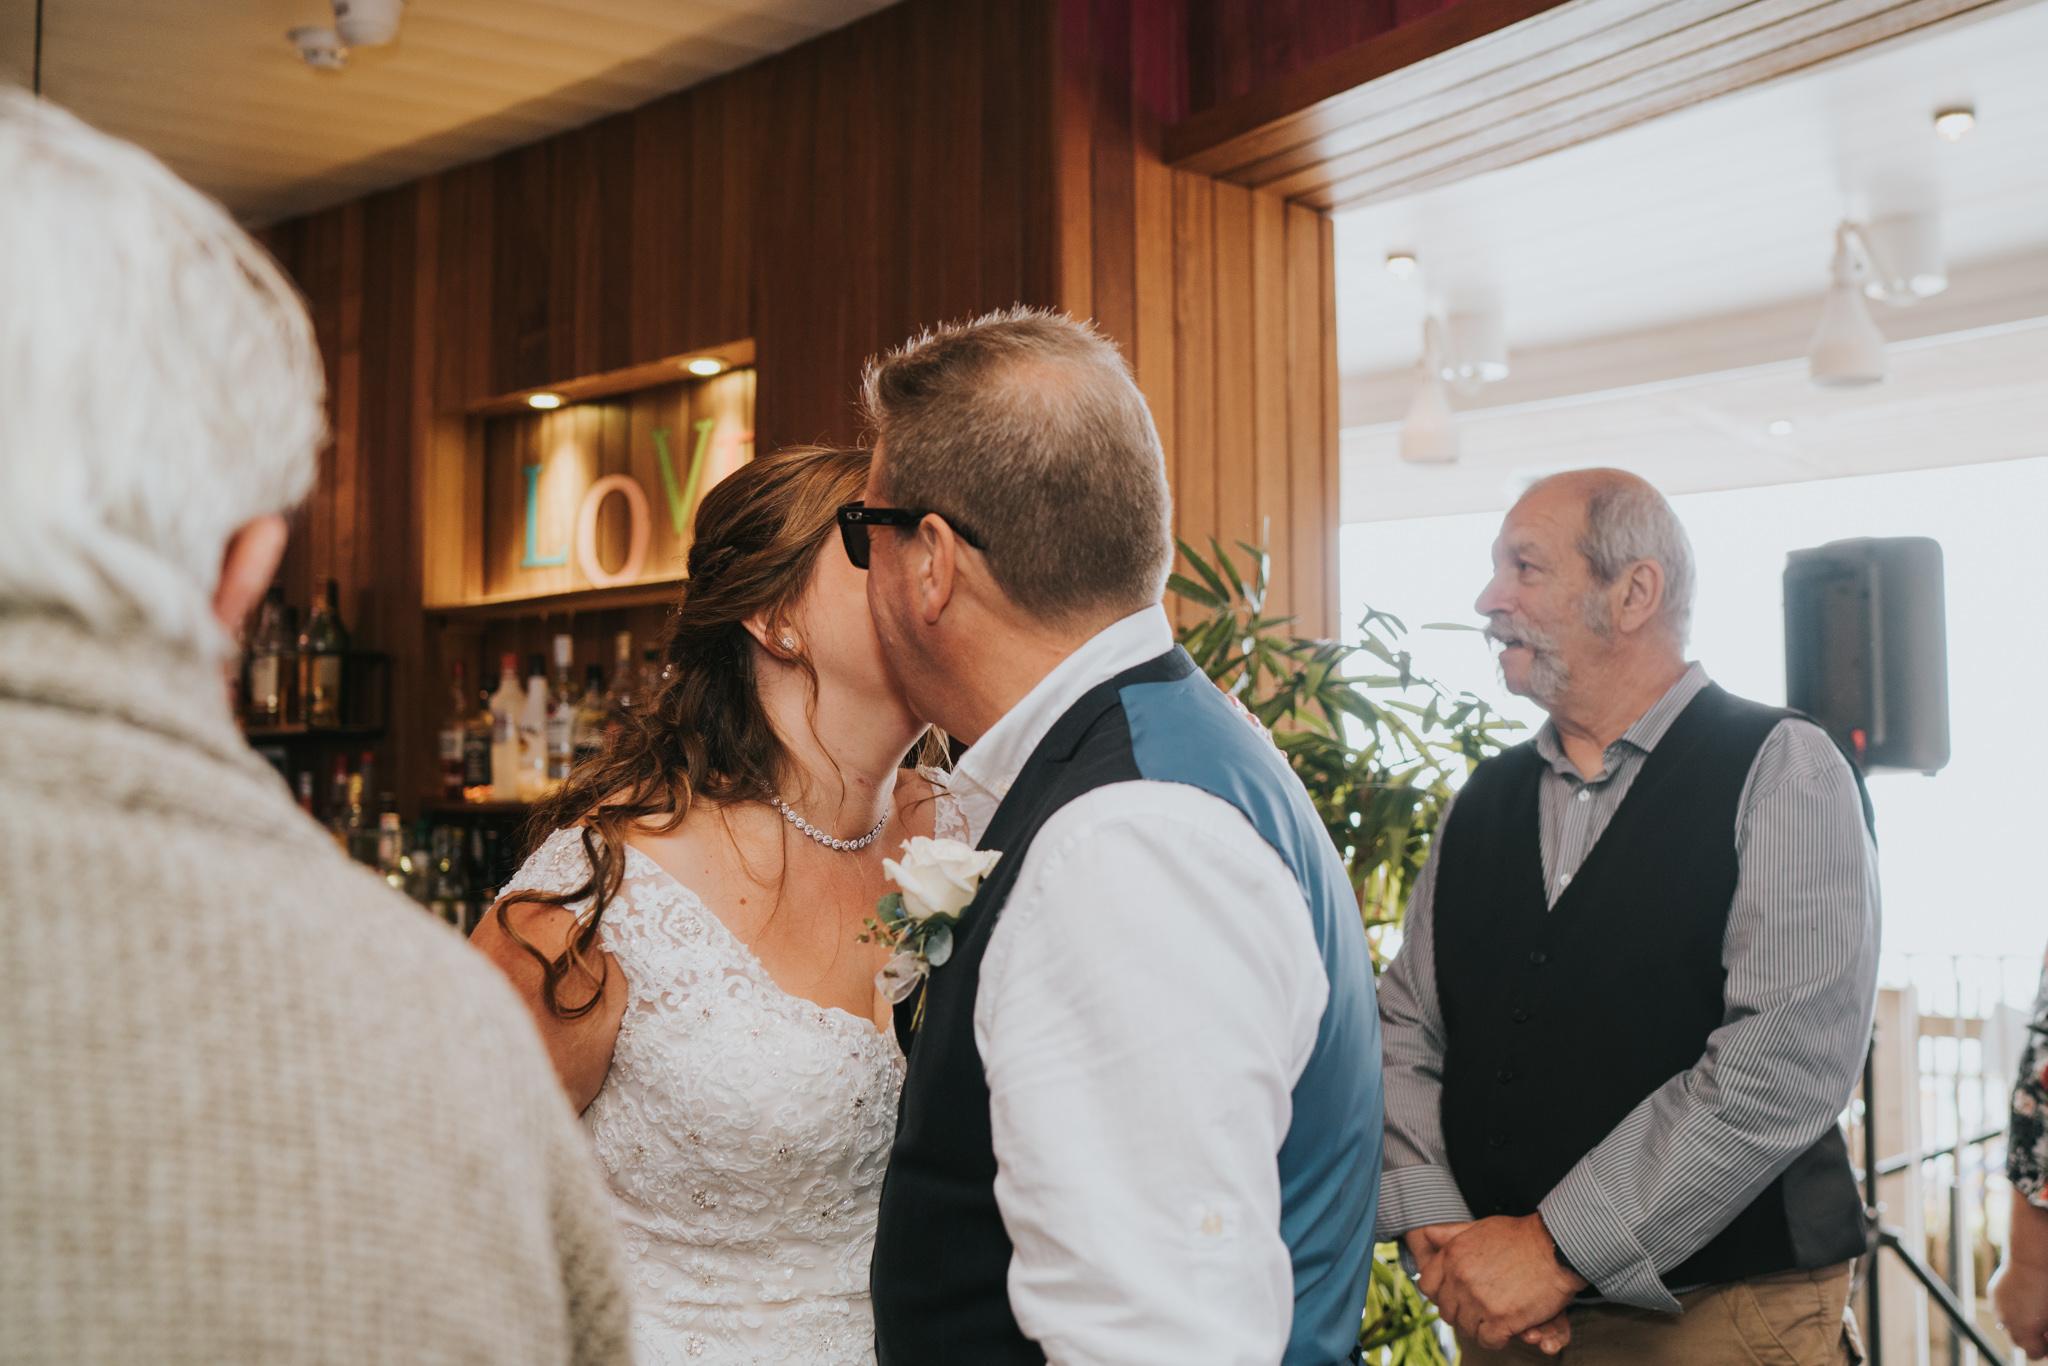 john-amy-relaxed-beach-wedding-tunnels-beaches-ilfracombe-north-devon-grace-elizabeth-colchester-essex-alternative-relaxed-wedding-photography-devon-suffolk-norfolk-essex (74 of 159).jpg